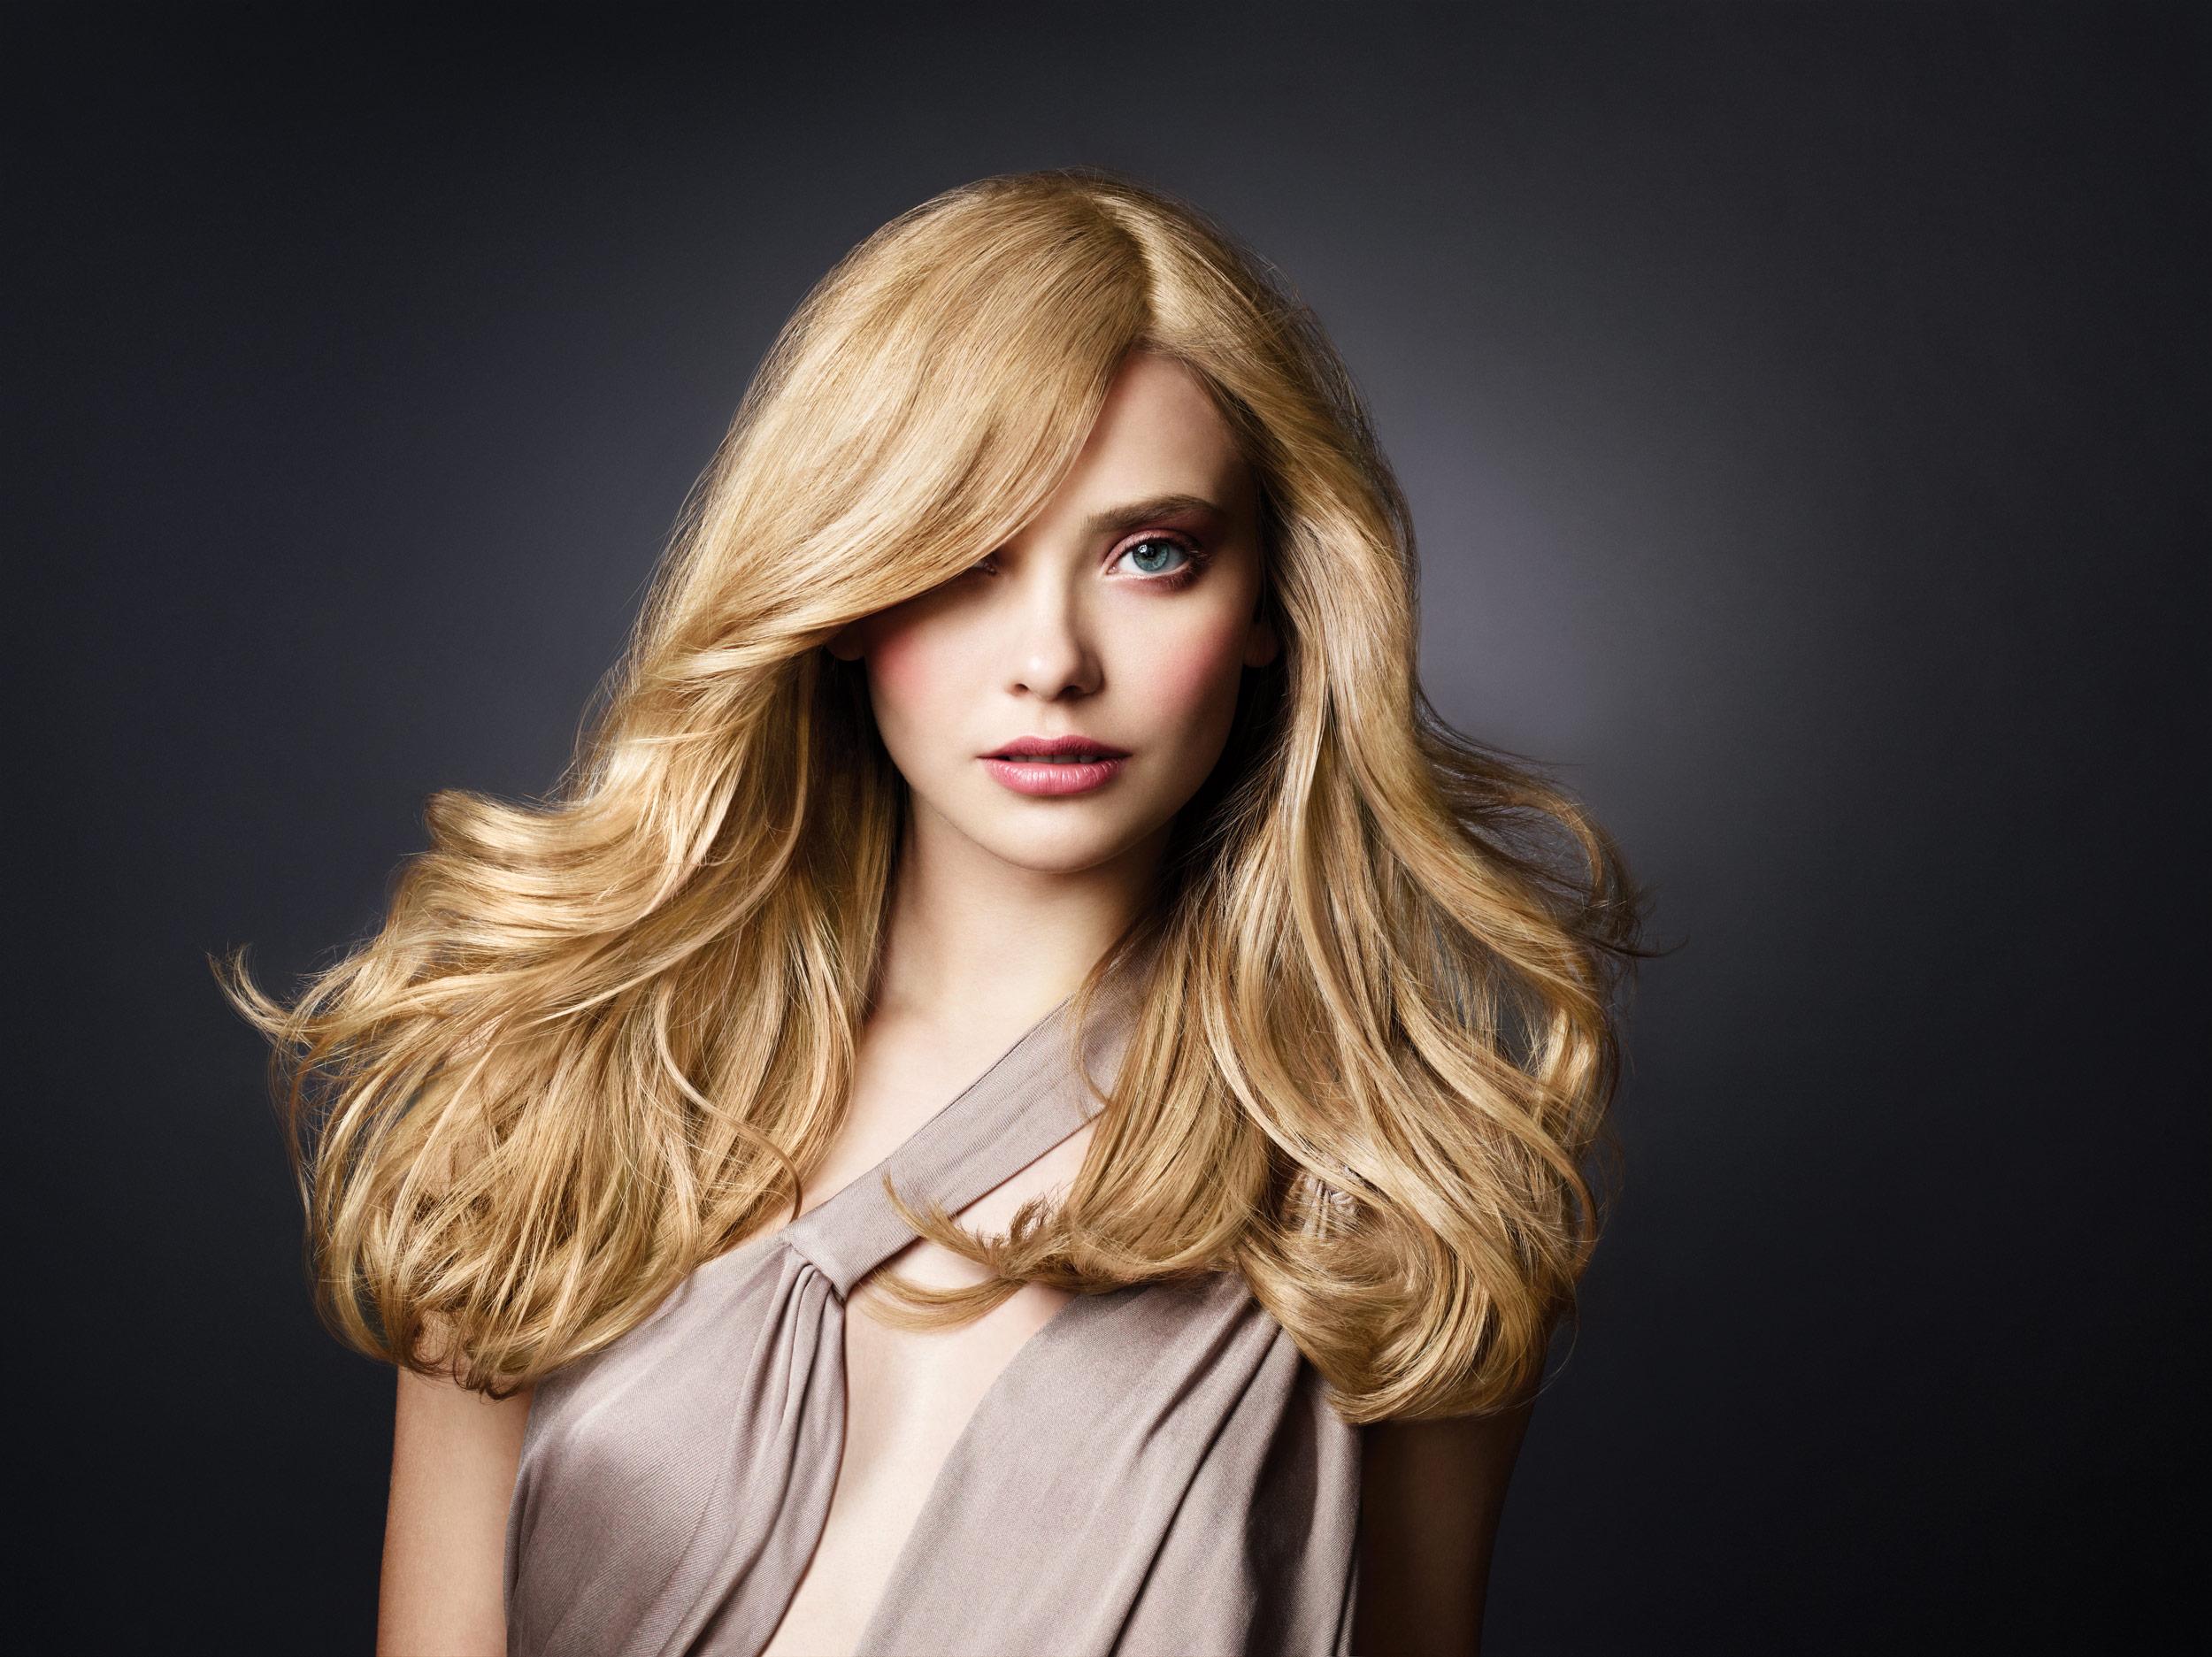 Mar13Model-Blonde_hq.jpg